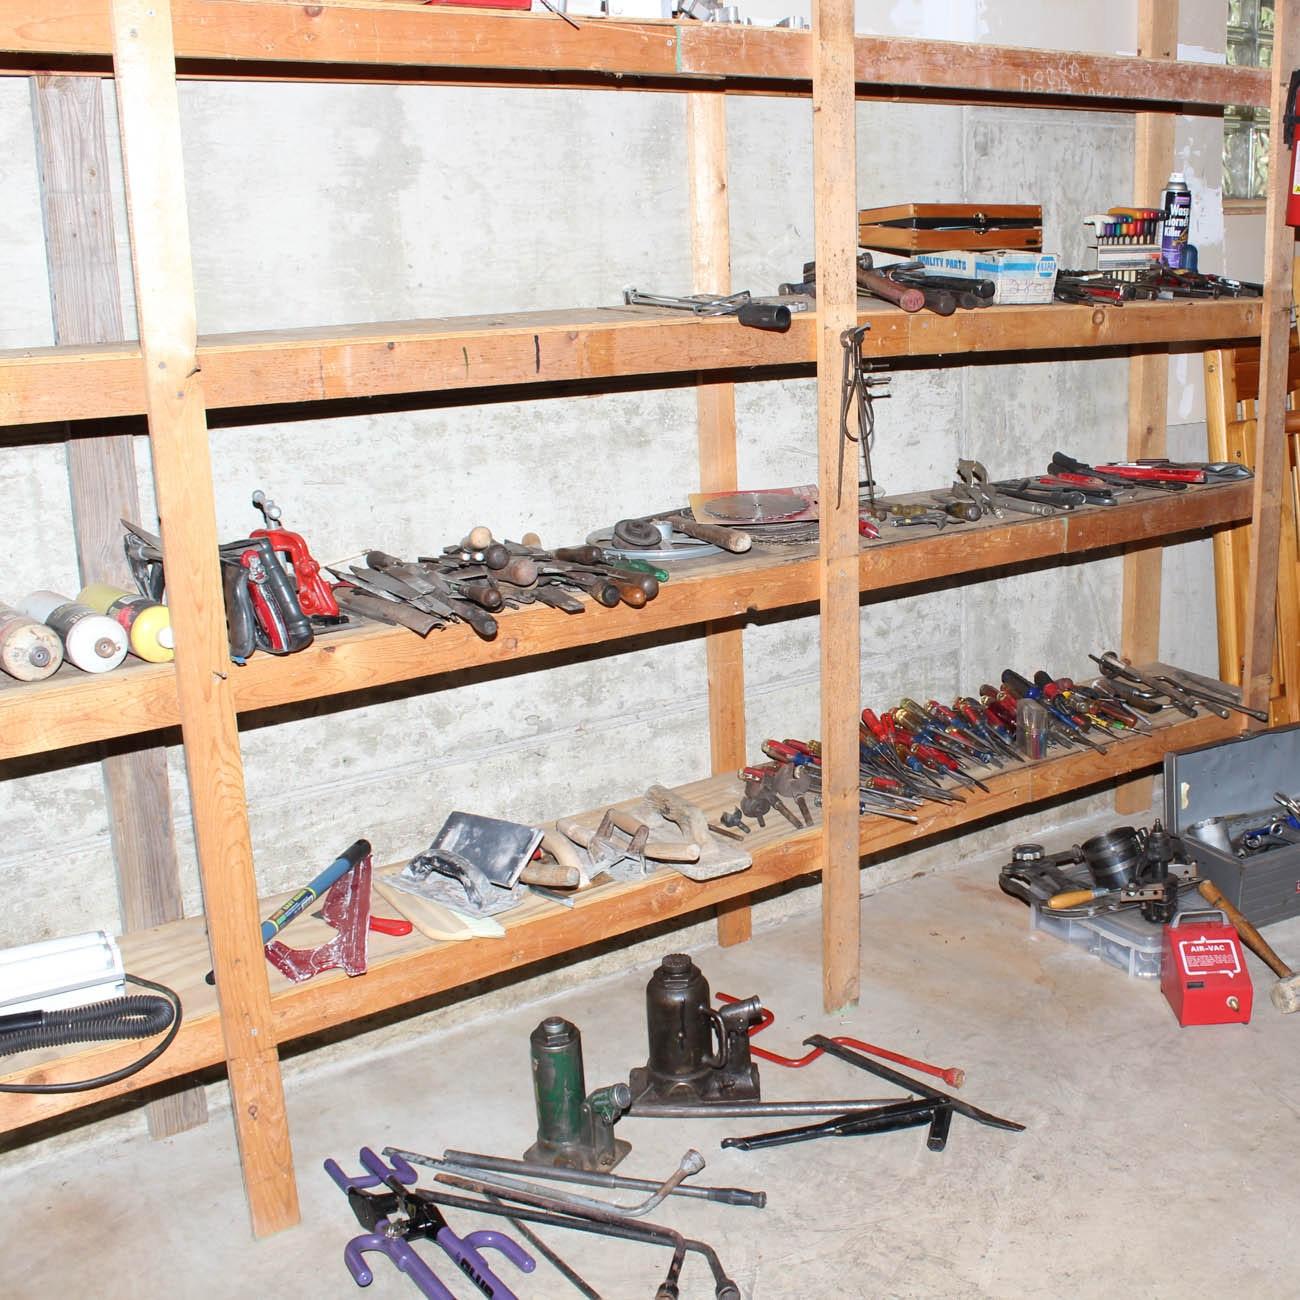 Generous Assortment of Hand Tools